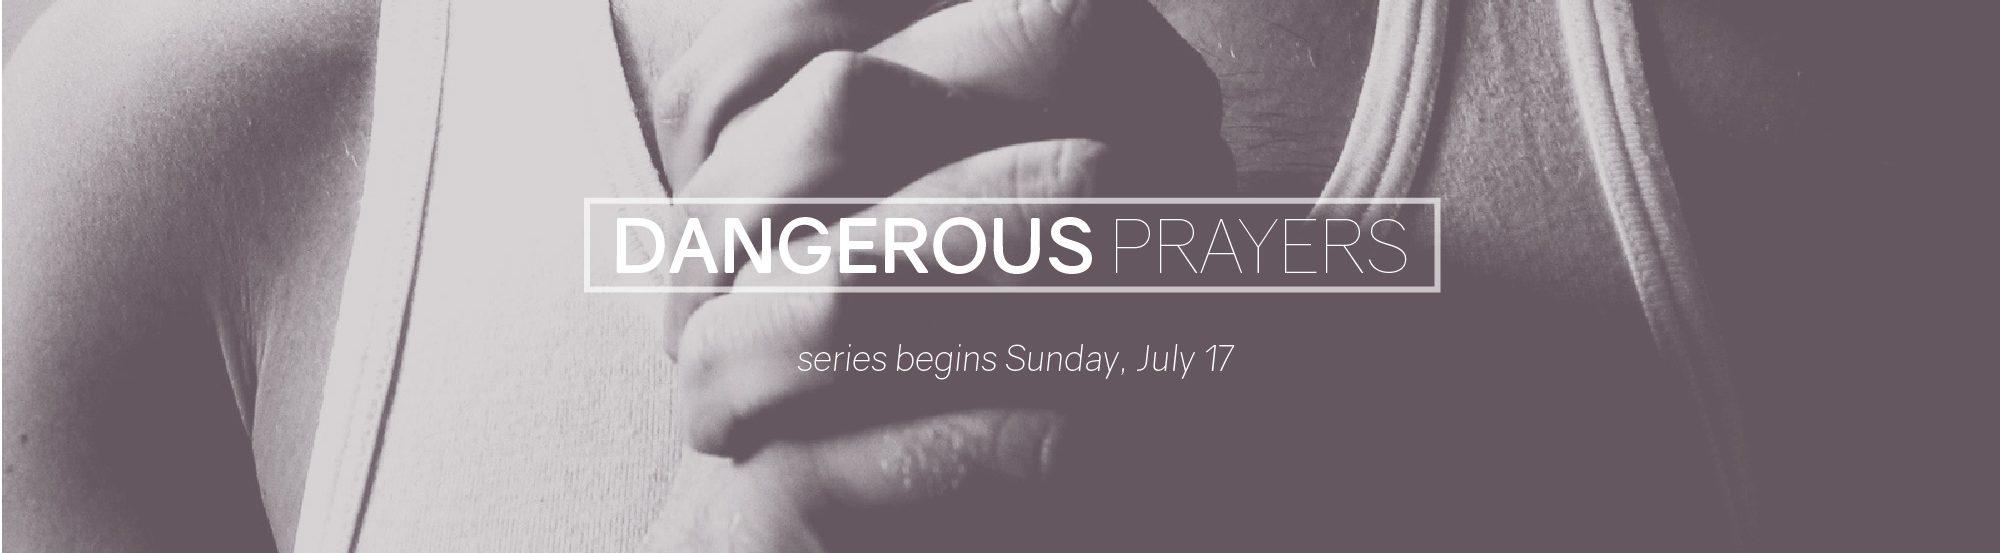 Dangerous-Prayers_Web banner